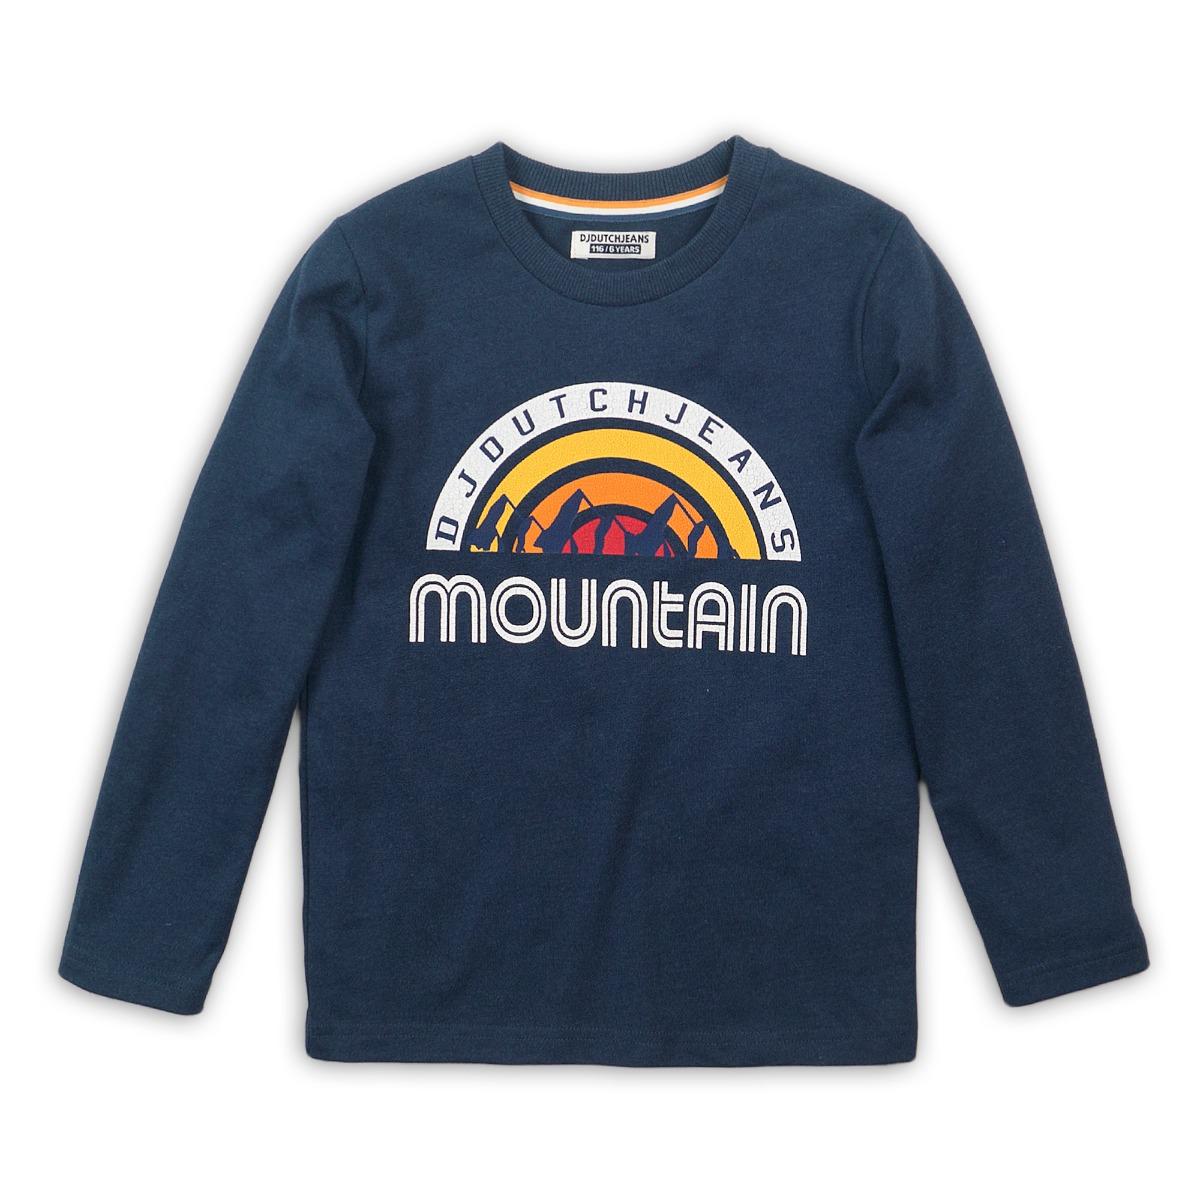 Tricou cu maneca lunga Mountain Dj Dutchjeans imagine